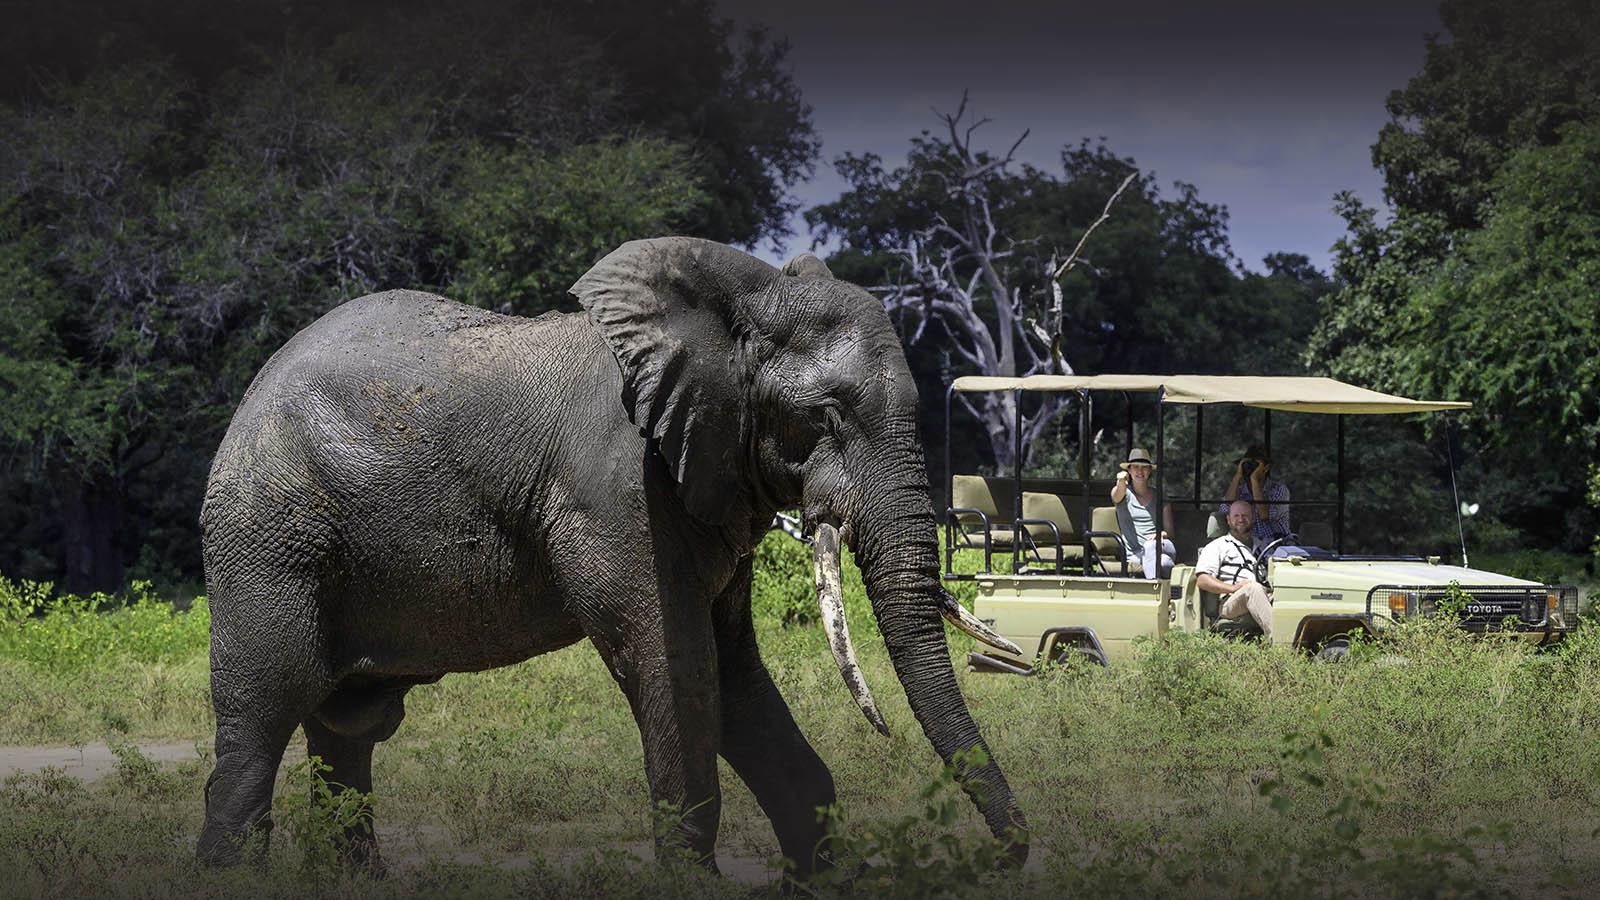 johns camp mana-pools-zimbabwe-accommodation-safari-zambia-in-style-elephant-game-drive